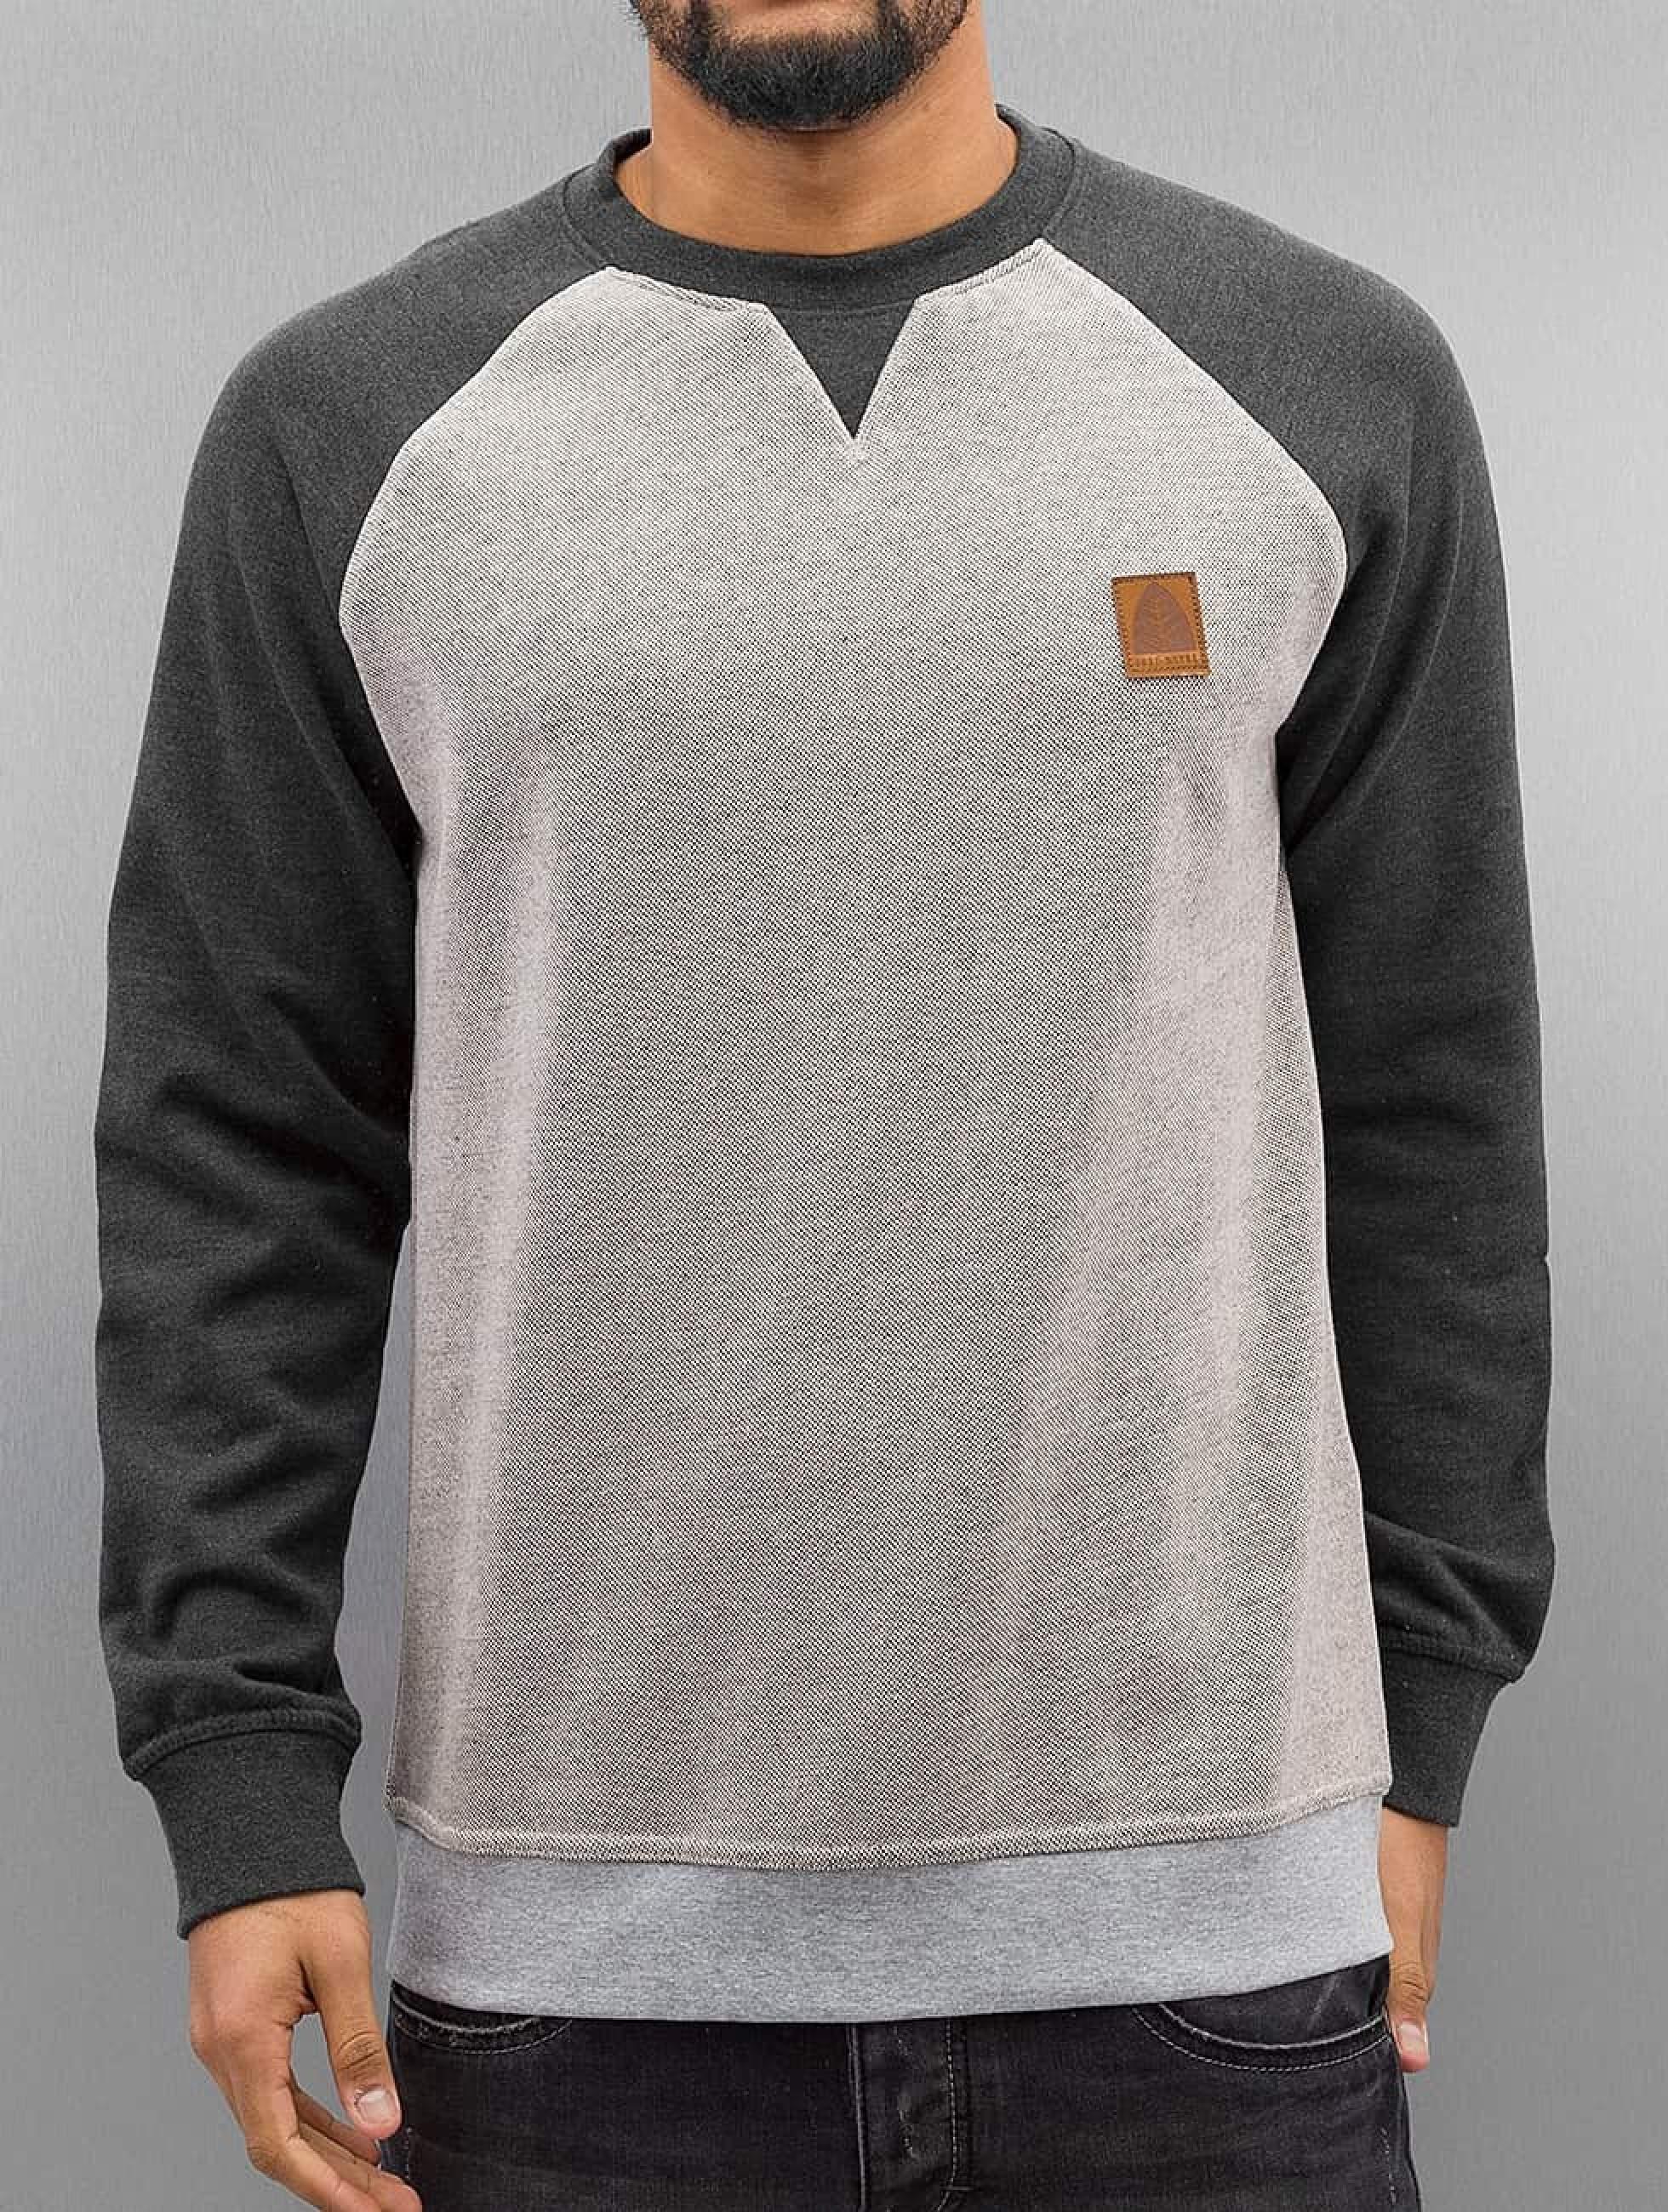 Just Sweatshirt MrRaglan Just Greyanthracite Rhyse Sweatshirt Just MrRaglan Rhyse Greyanthracite vybY7I6fgm